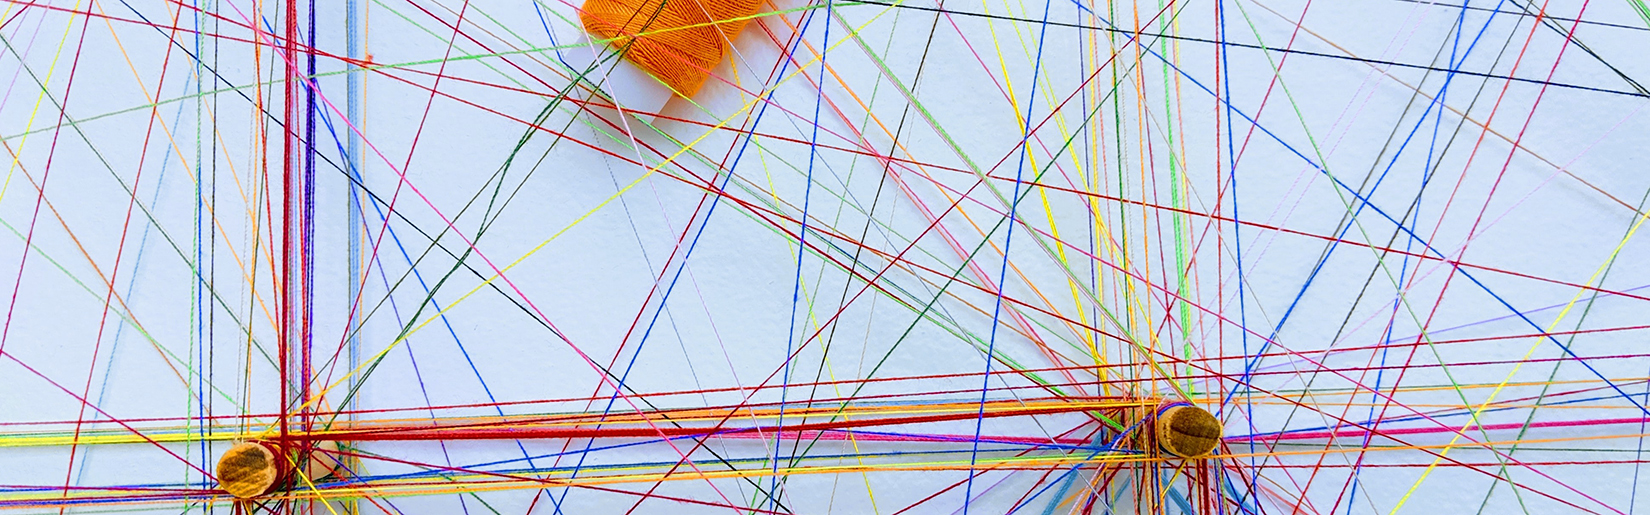 web of threads